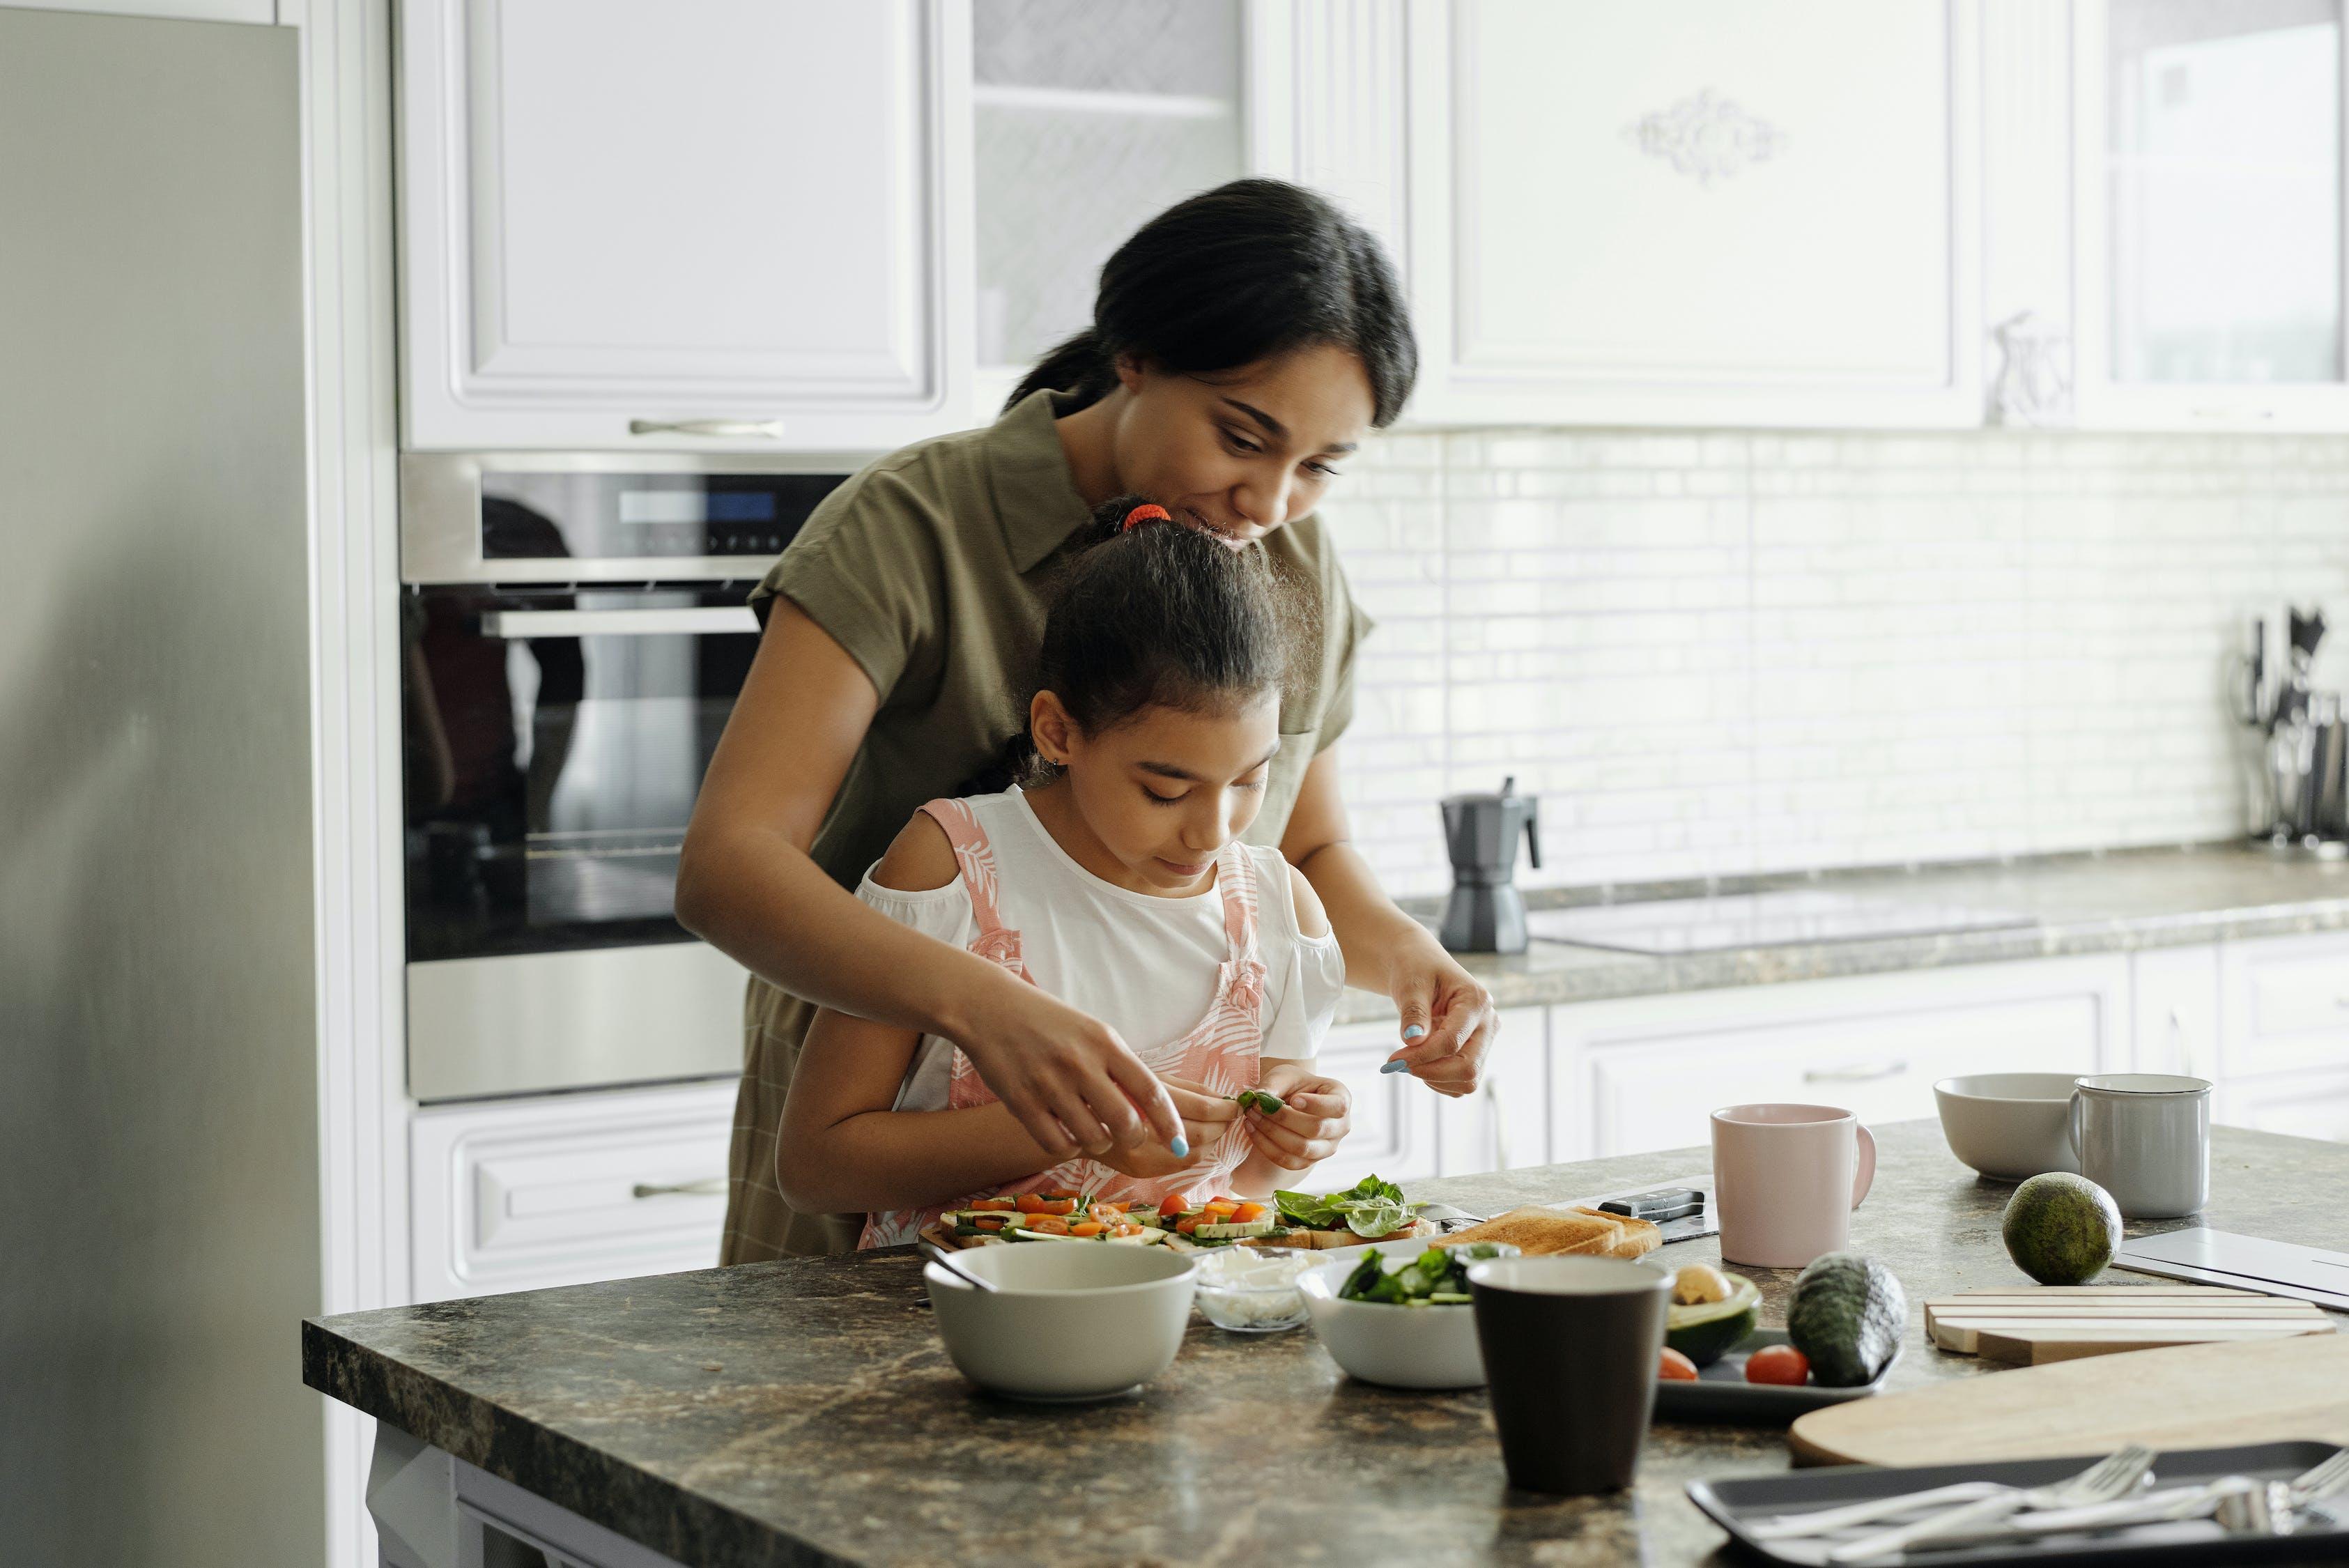 https://images.pexels.com/photos/4259707/pexels-photo-4259707.jpeg?auto=compress&cs=tinysrgb&dpr=3&h=750&w=1260 ทำอาหารในครอบครัว